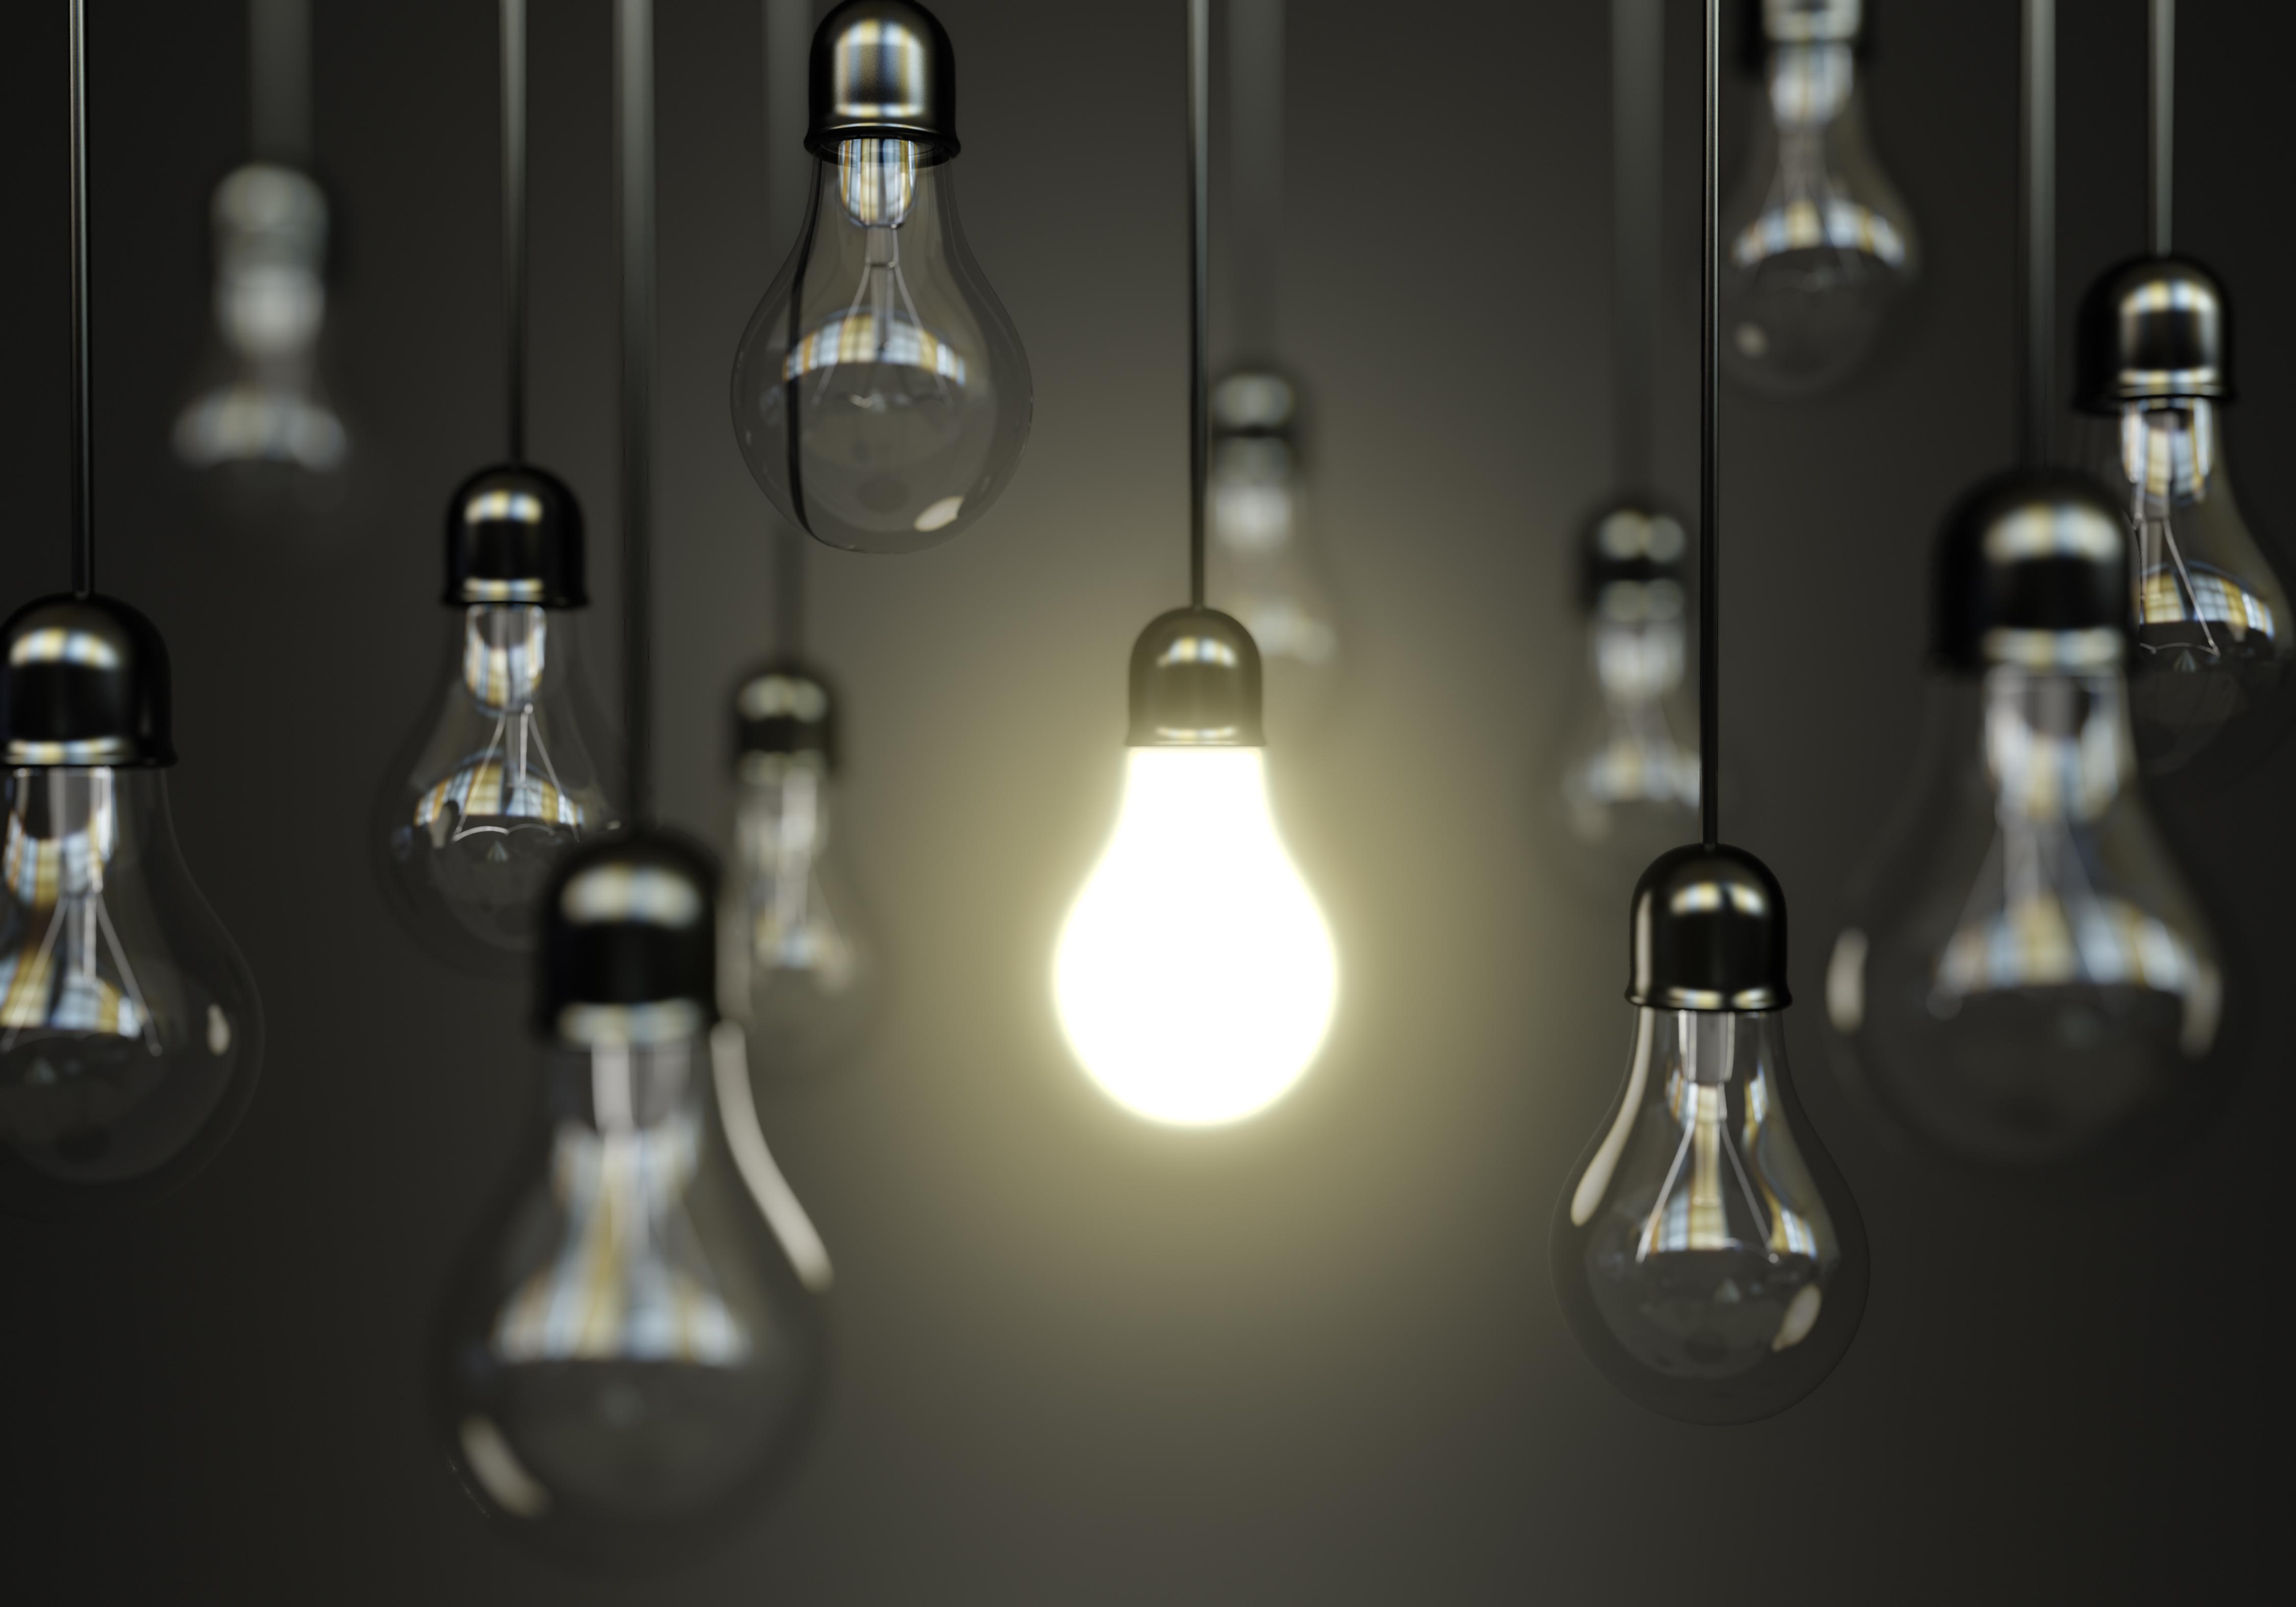 3 Tips to Study Smarter